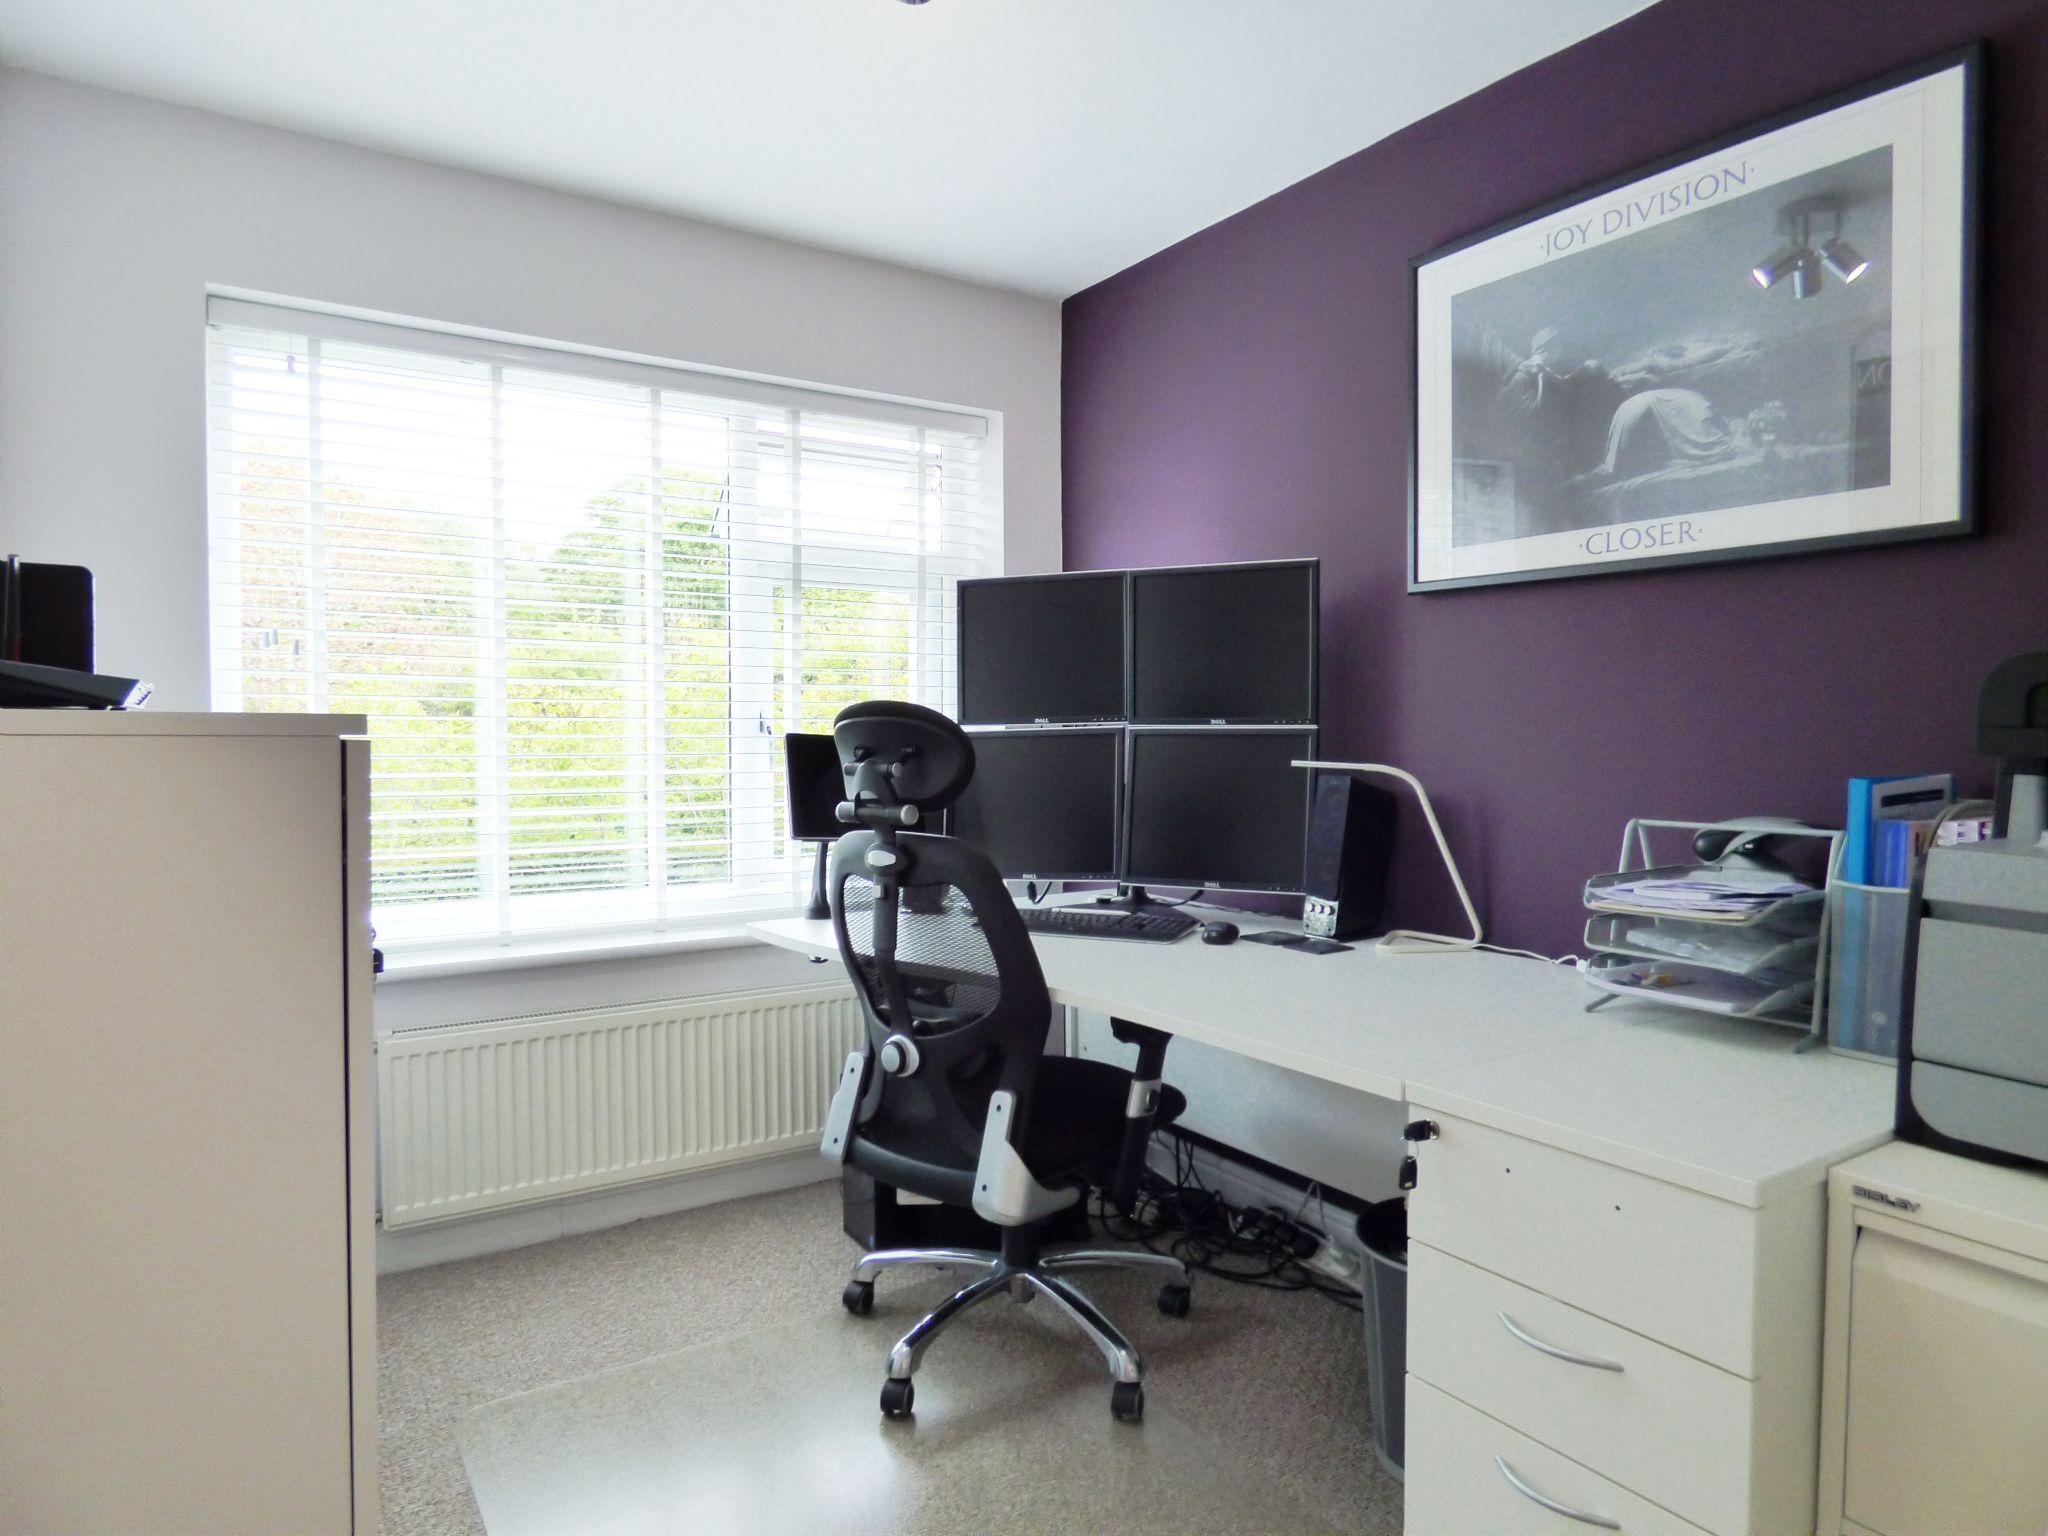 5 Bedroom Semi-detached House For Sale - Home Office / Bedroom Five